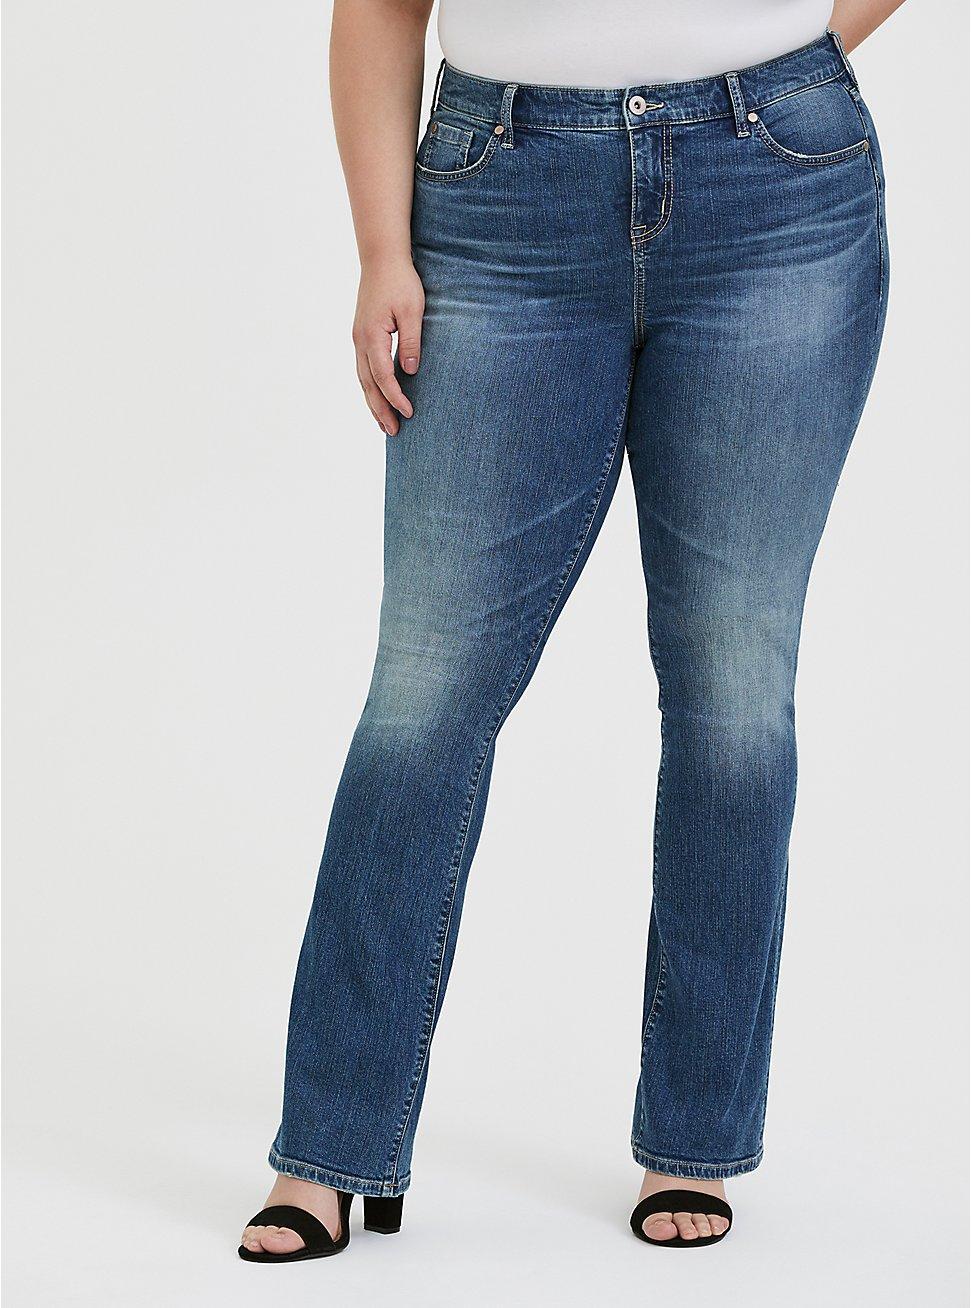 Slim Boot Jean- Vintage Wash Medium Stretch, SHELBY 68, hi-res